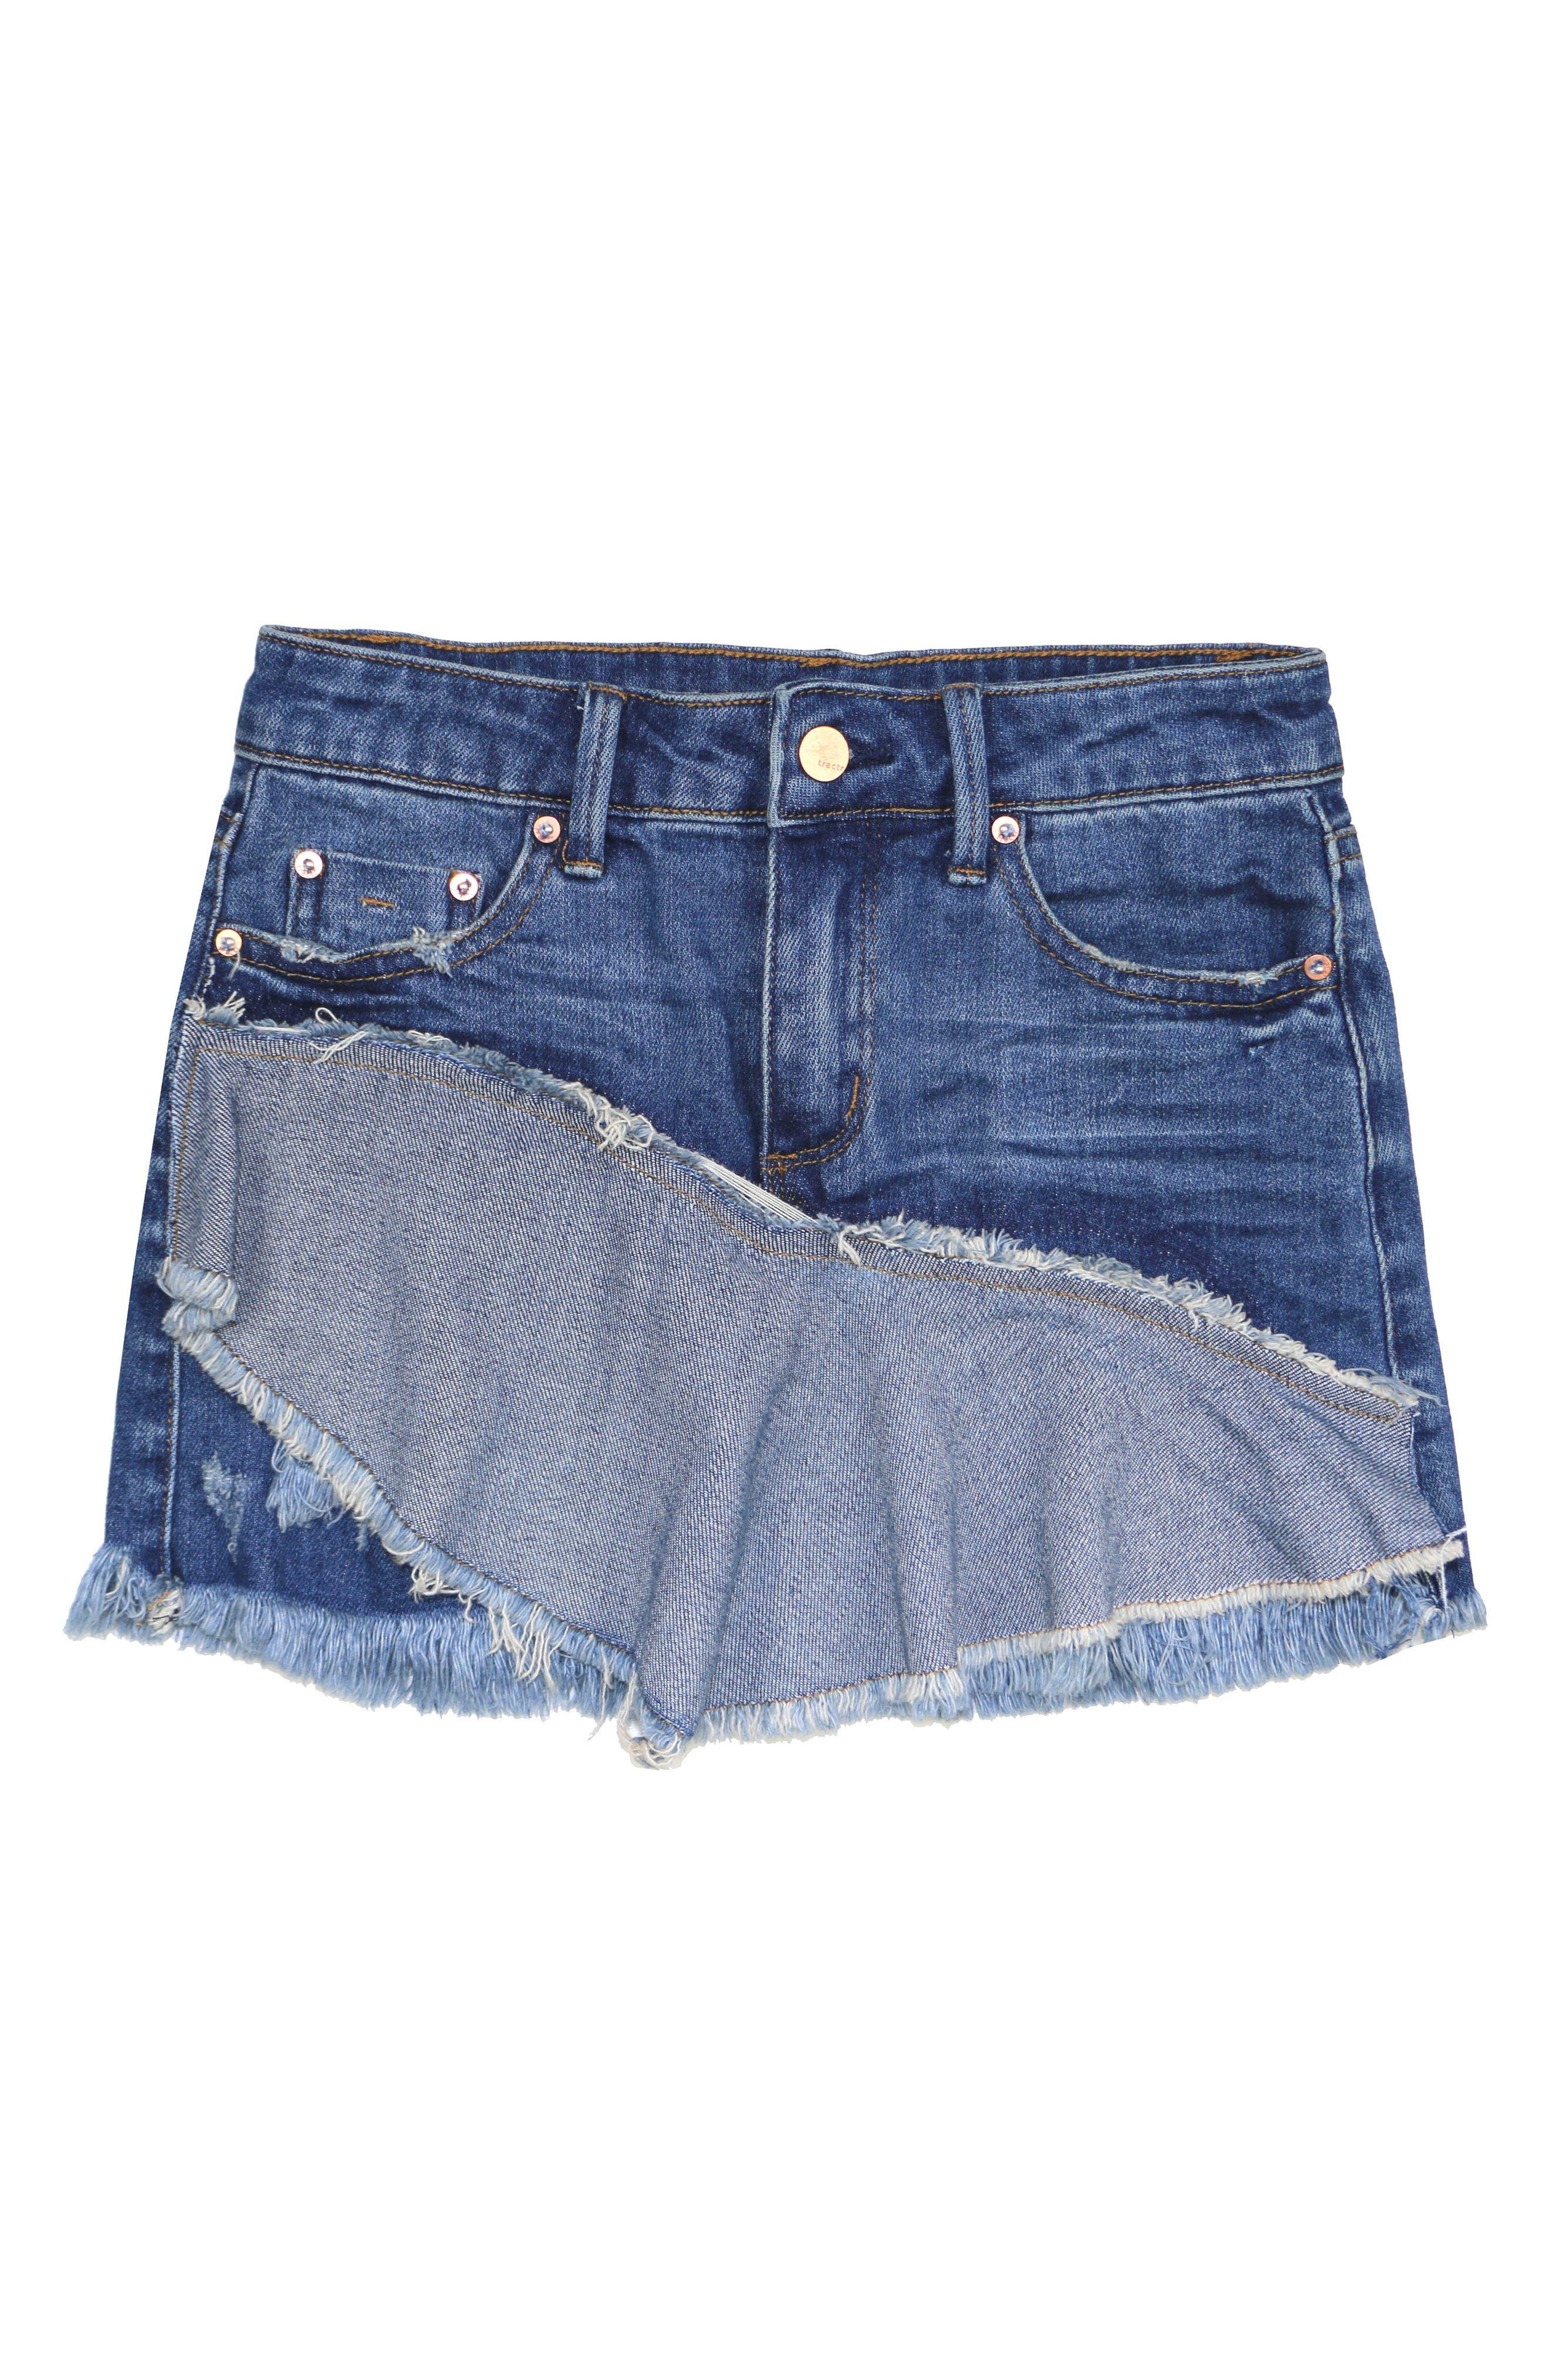 Tractr Distressed Pieced Denim Skirt (Big Girls)